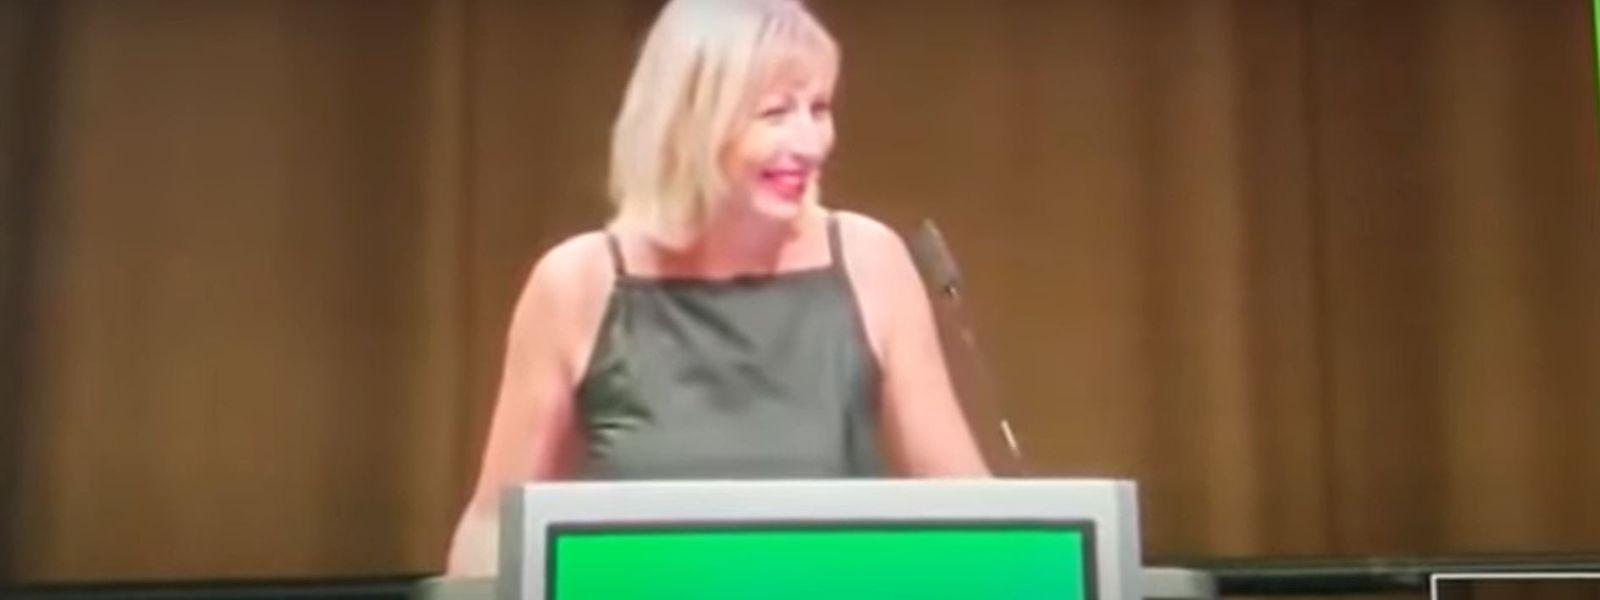 Nicht ihr stärkster Moment: Irina Gaydukova muss bei klassisch grünen Themen passen.